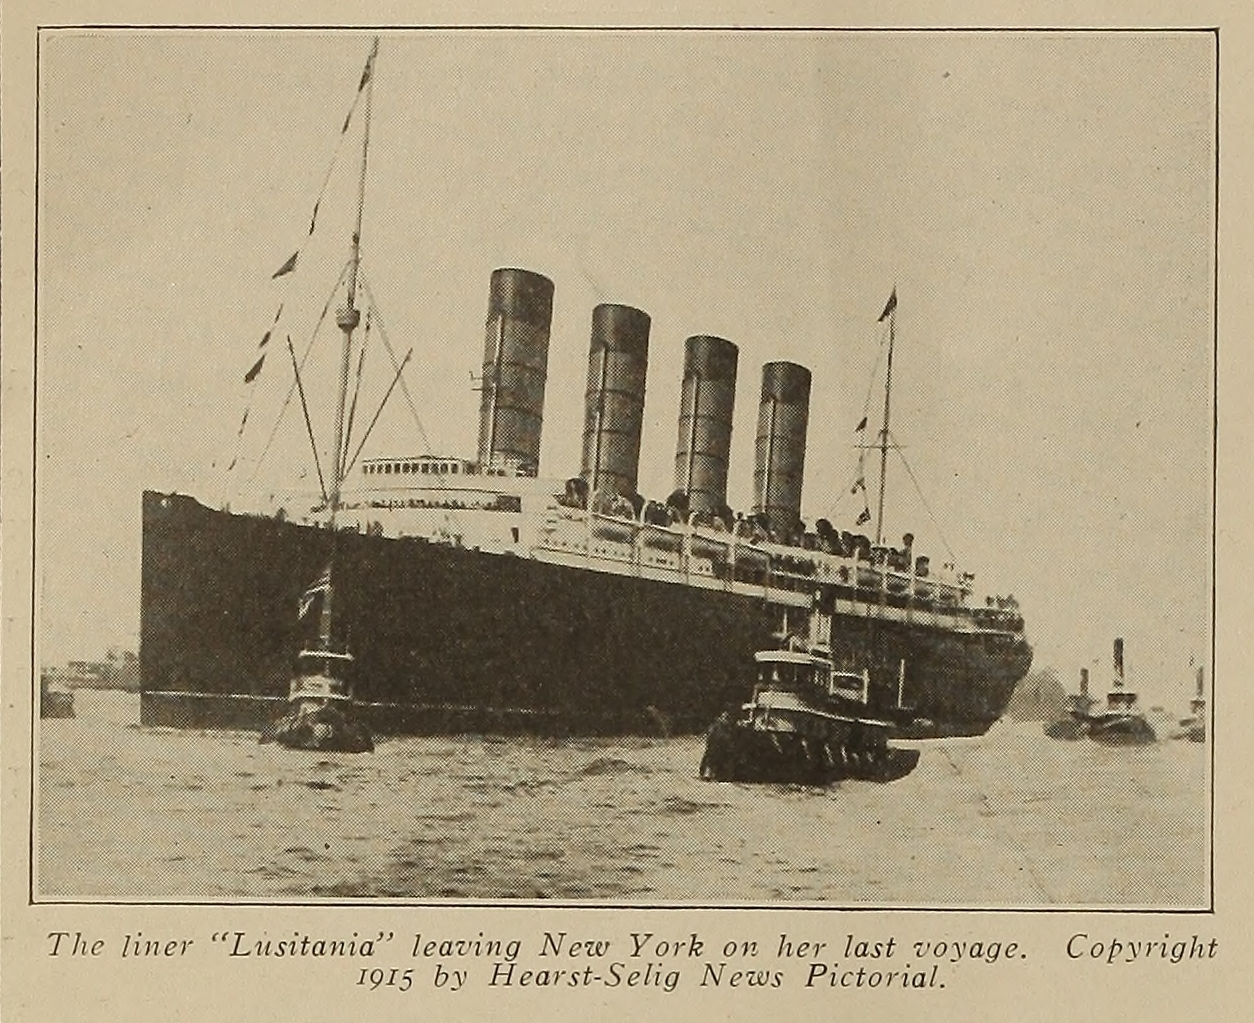 Lusitania leaving NY from Motography